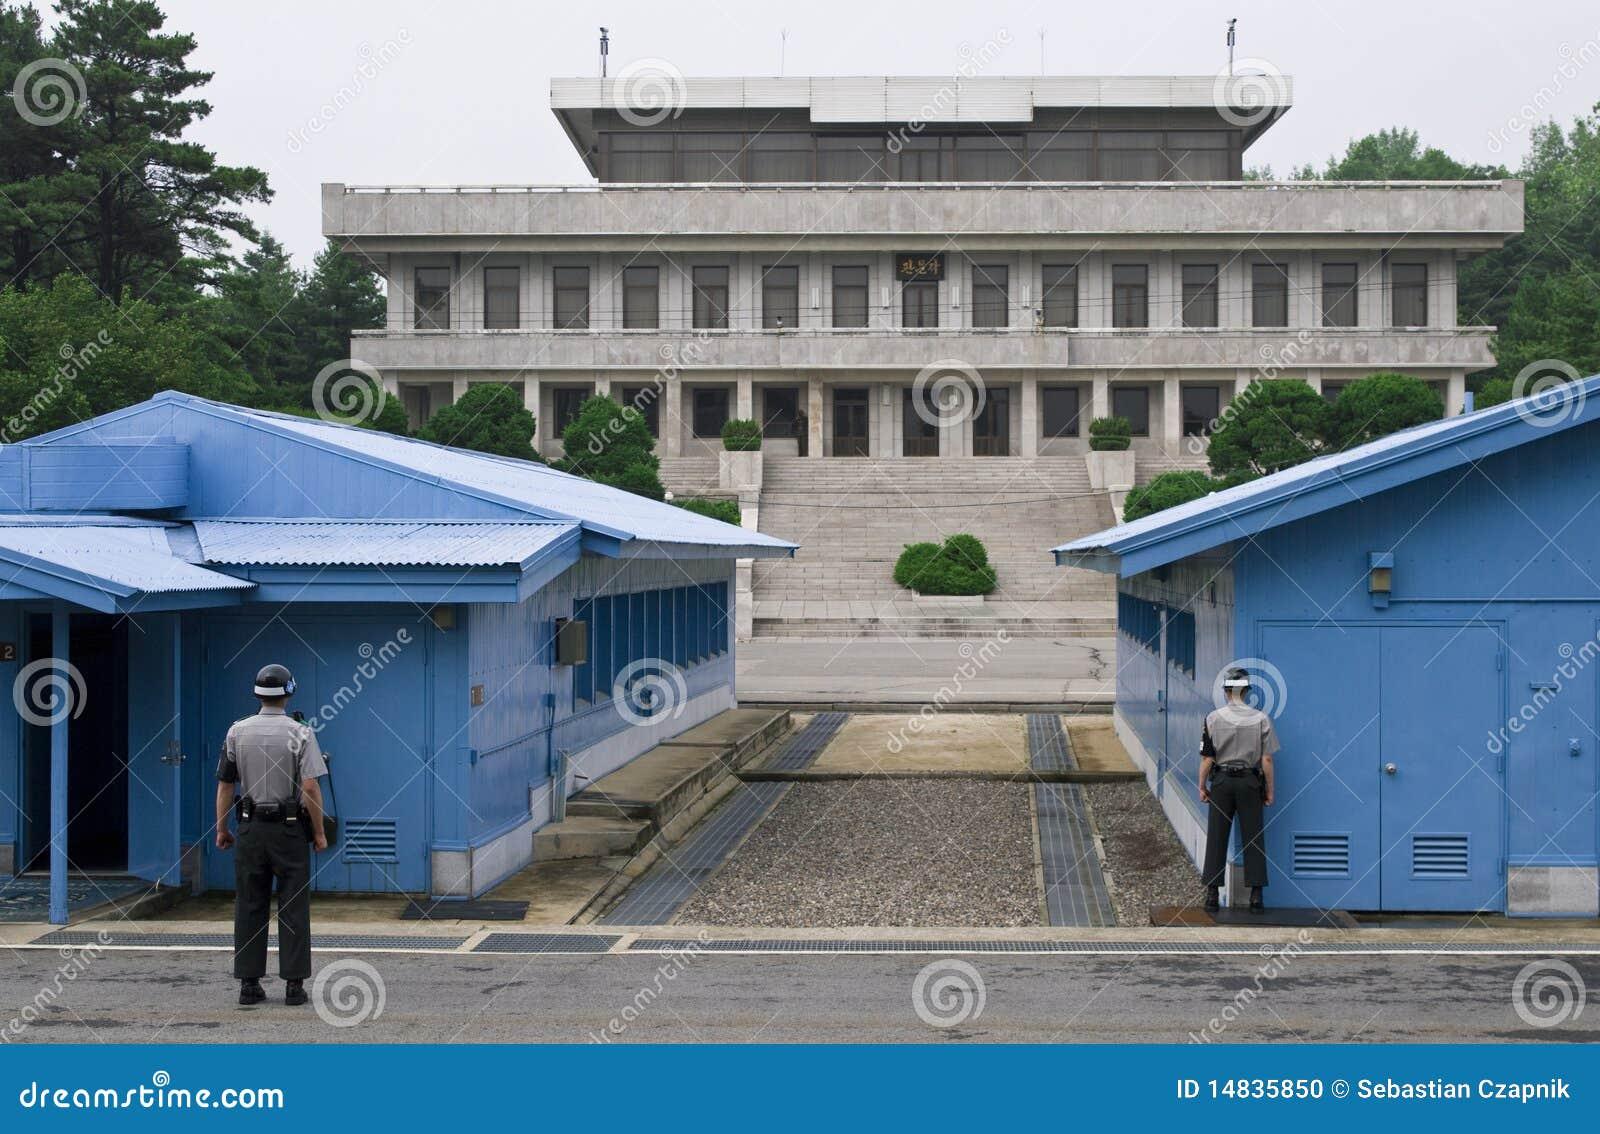 JSA (DMZ) Korea